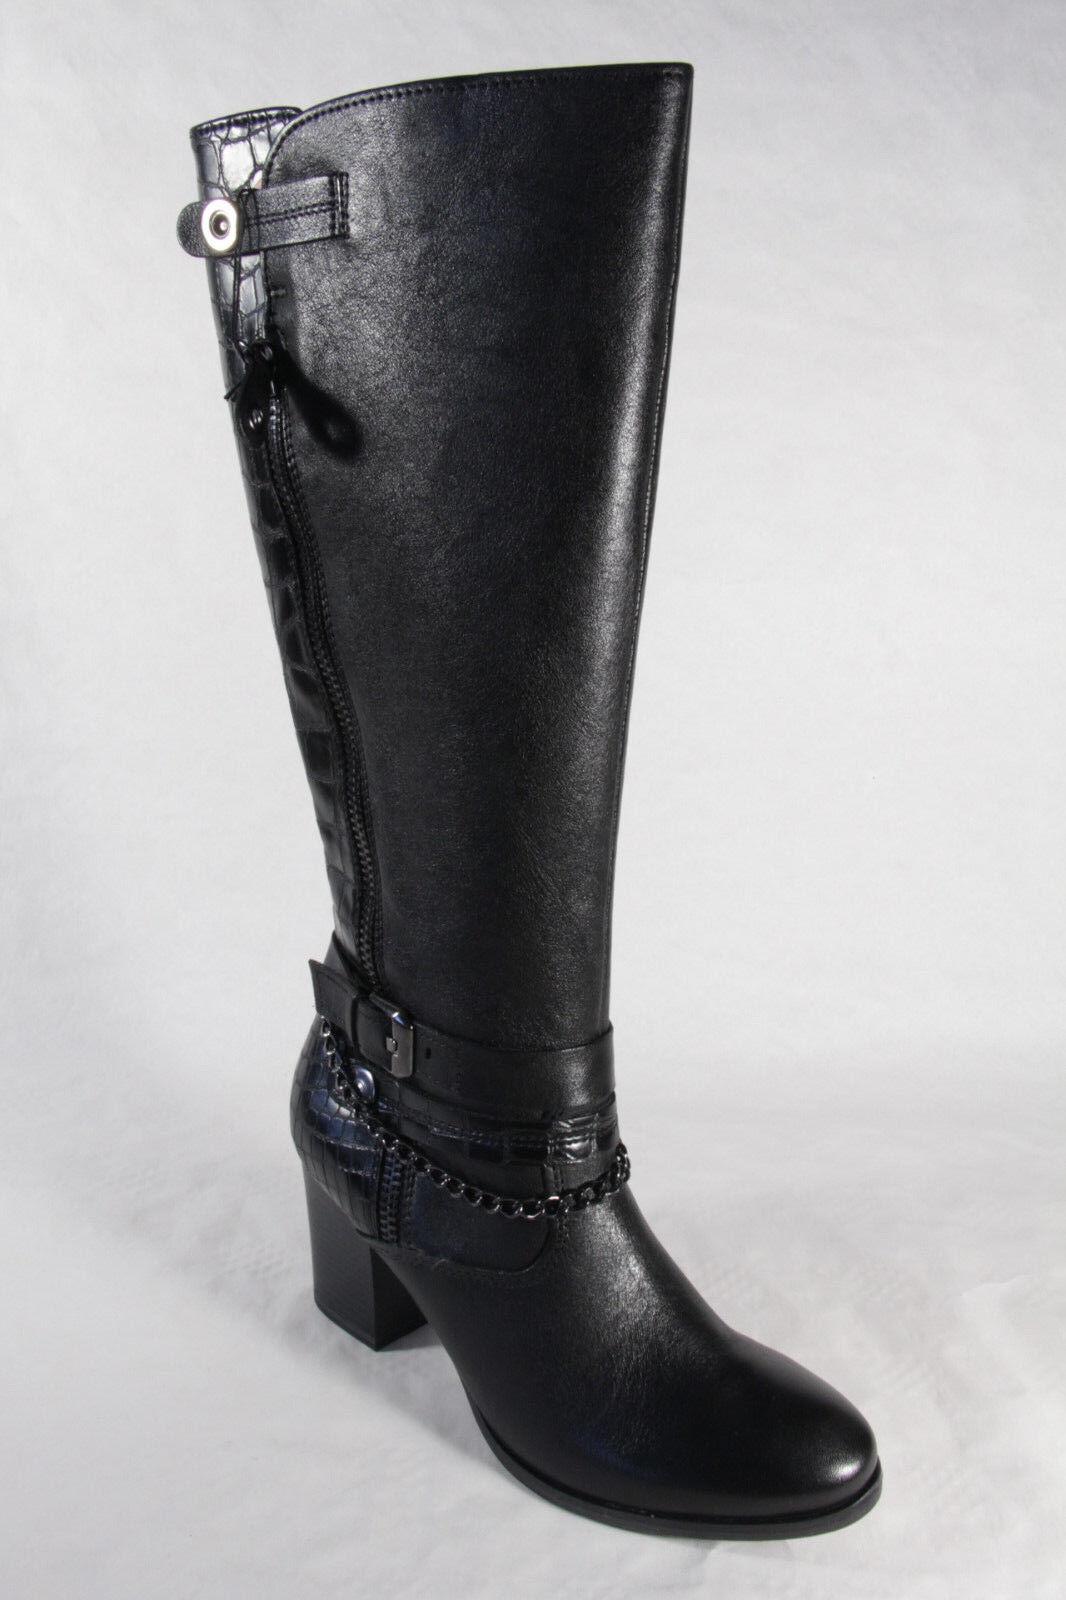 Marco Boots Tozzi 25518 Stiefel, Stiefelette, Boots Marco Echtleder schwarz  NEU 9ce76f